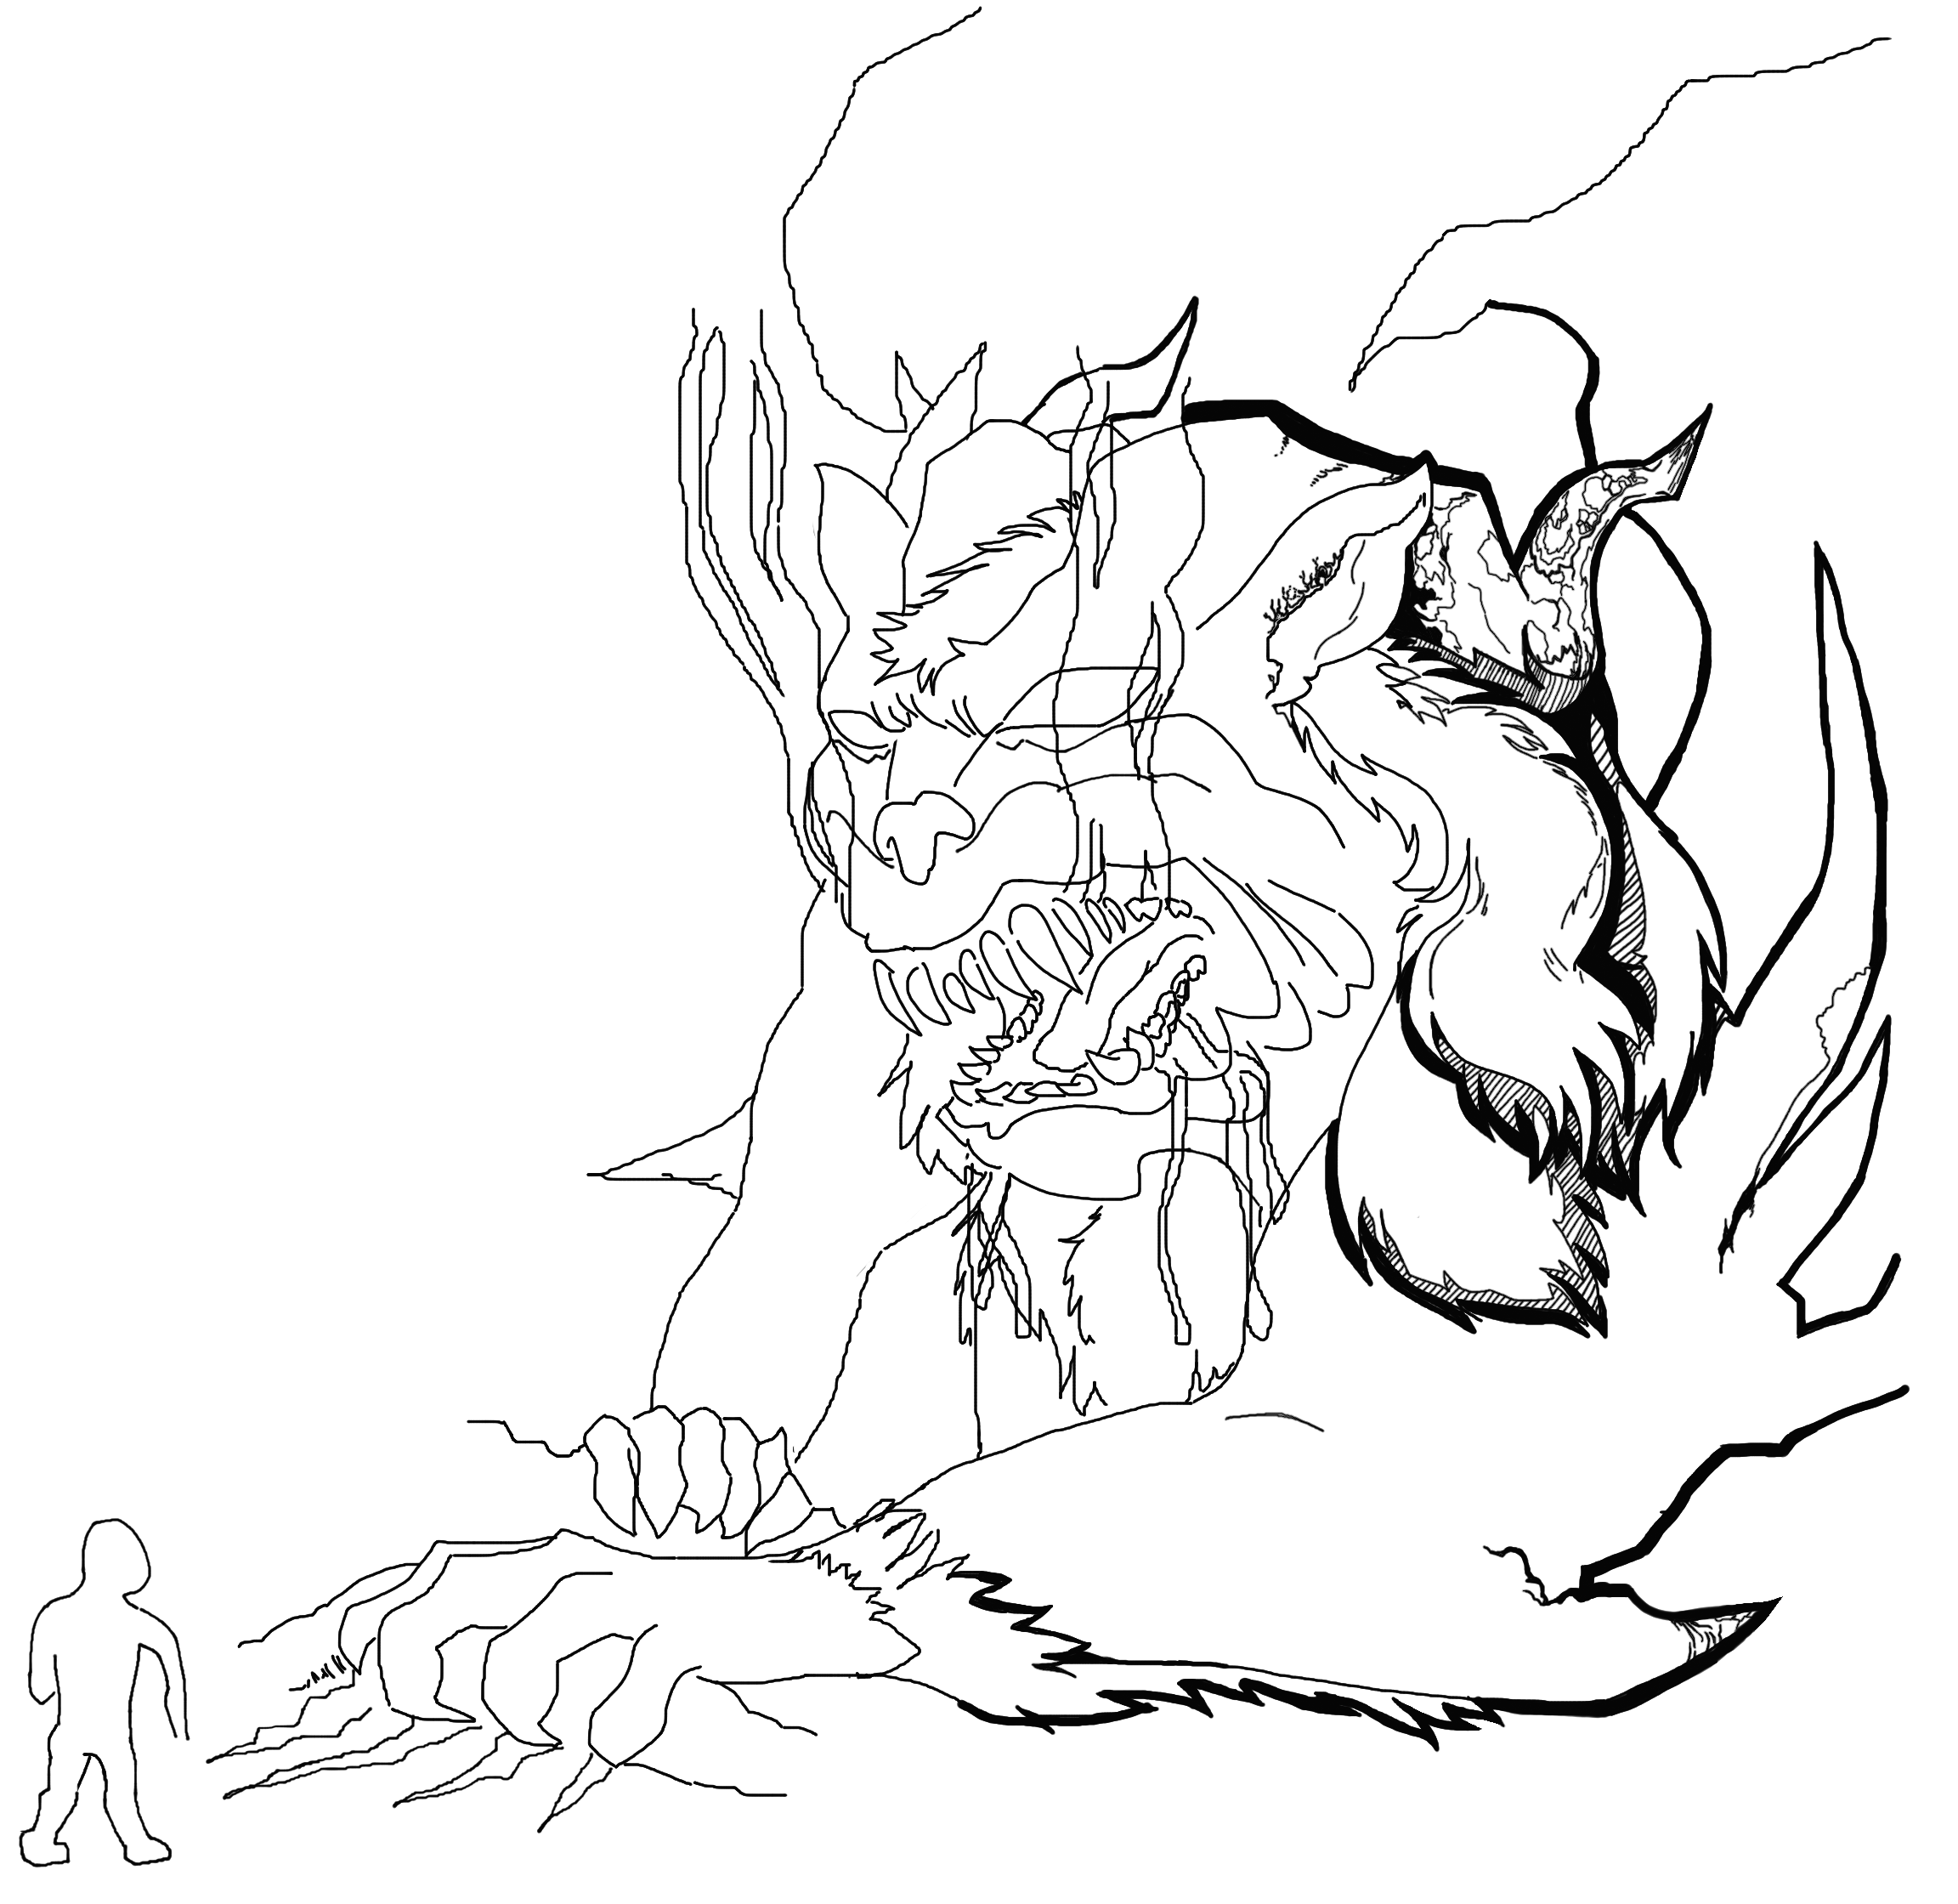 Soldier Against Hell Beast Sketch